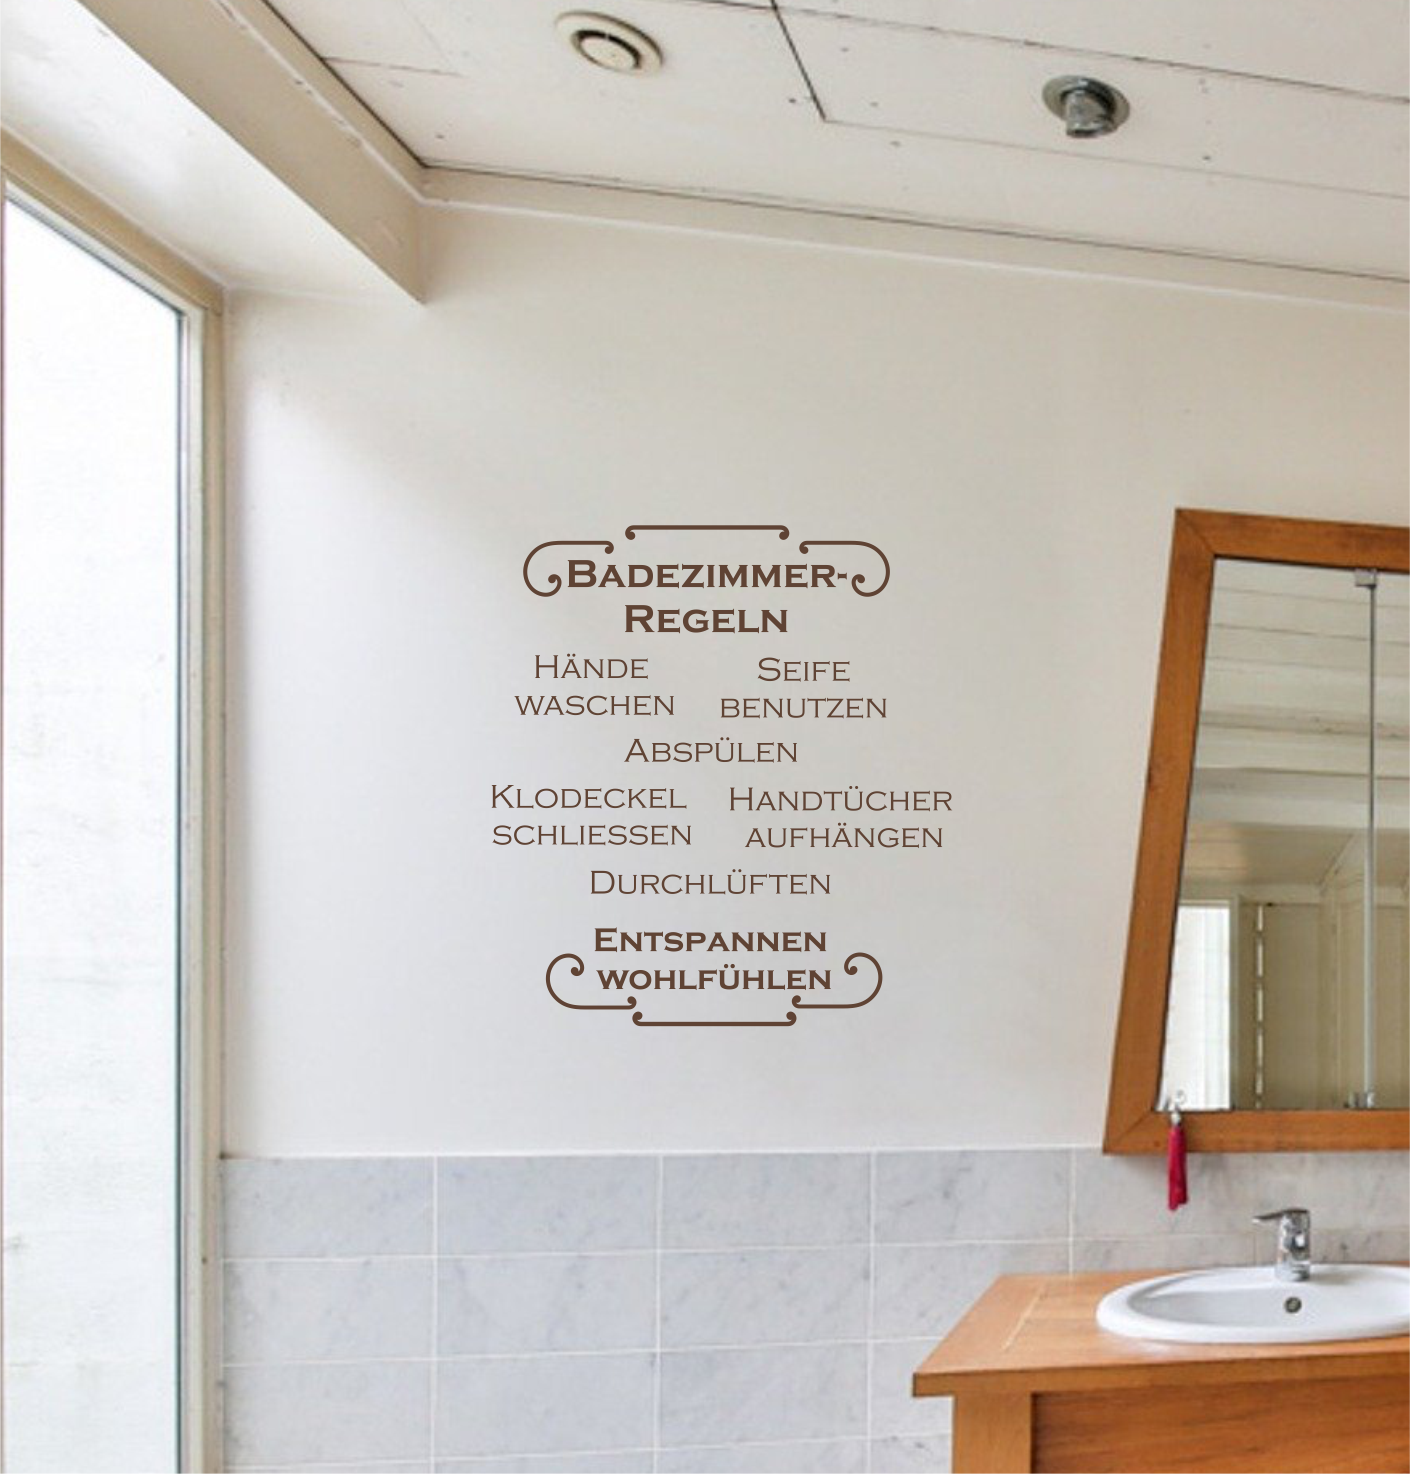 "Wandtattoo ""Badezimmer-regeln""."